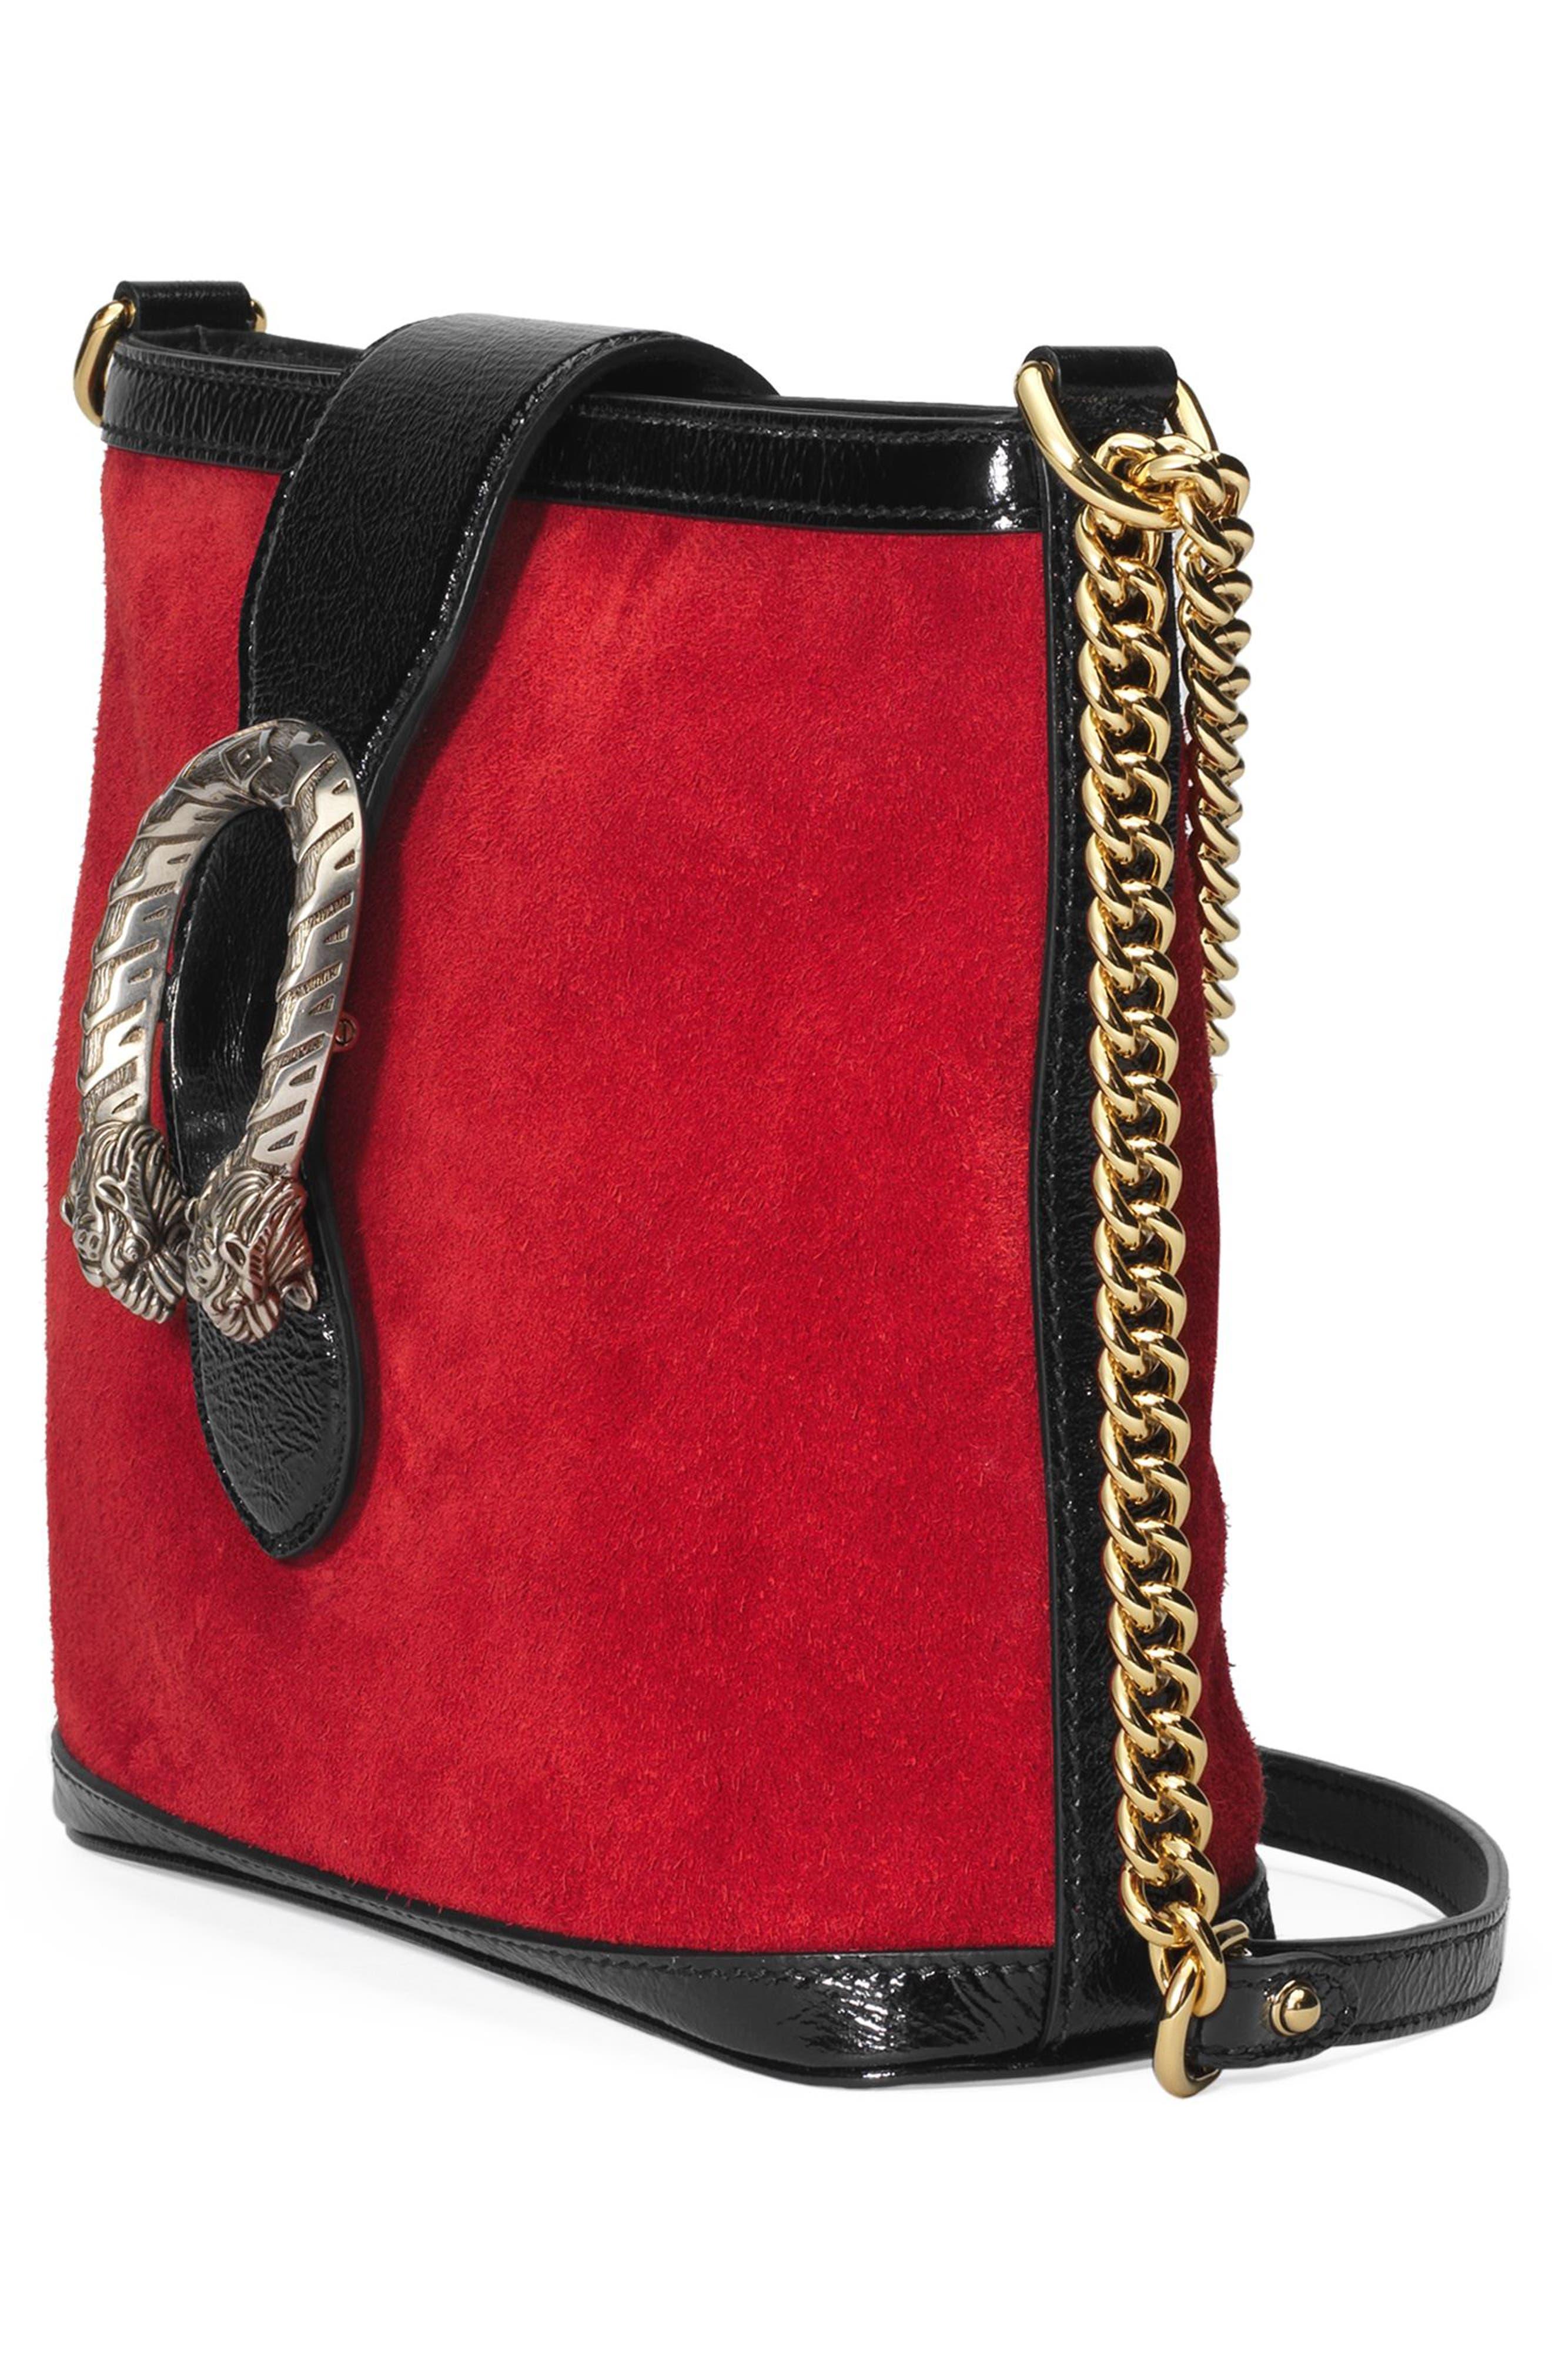 GUCCI,                             Medium Dionysus Suede Shoulder Bag,                             Alternate thumbnail 4, color,                             HIBISCUS RED/ NERO